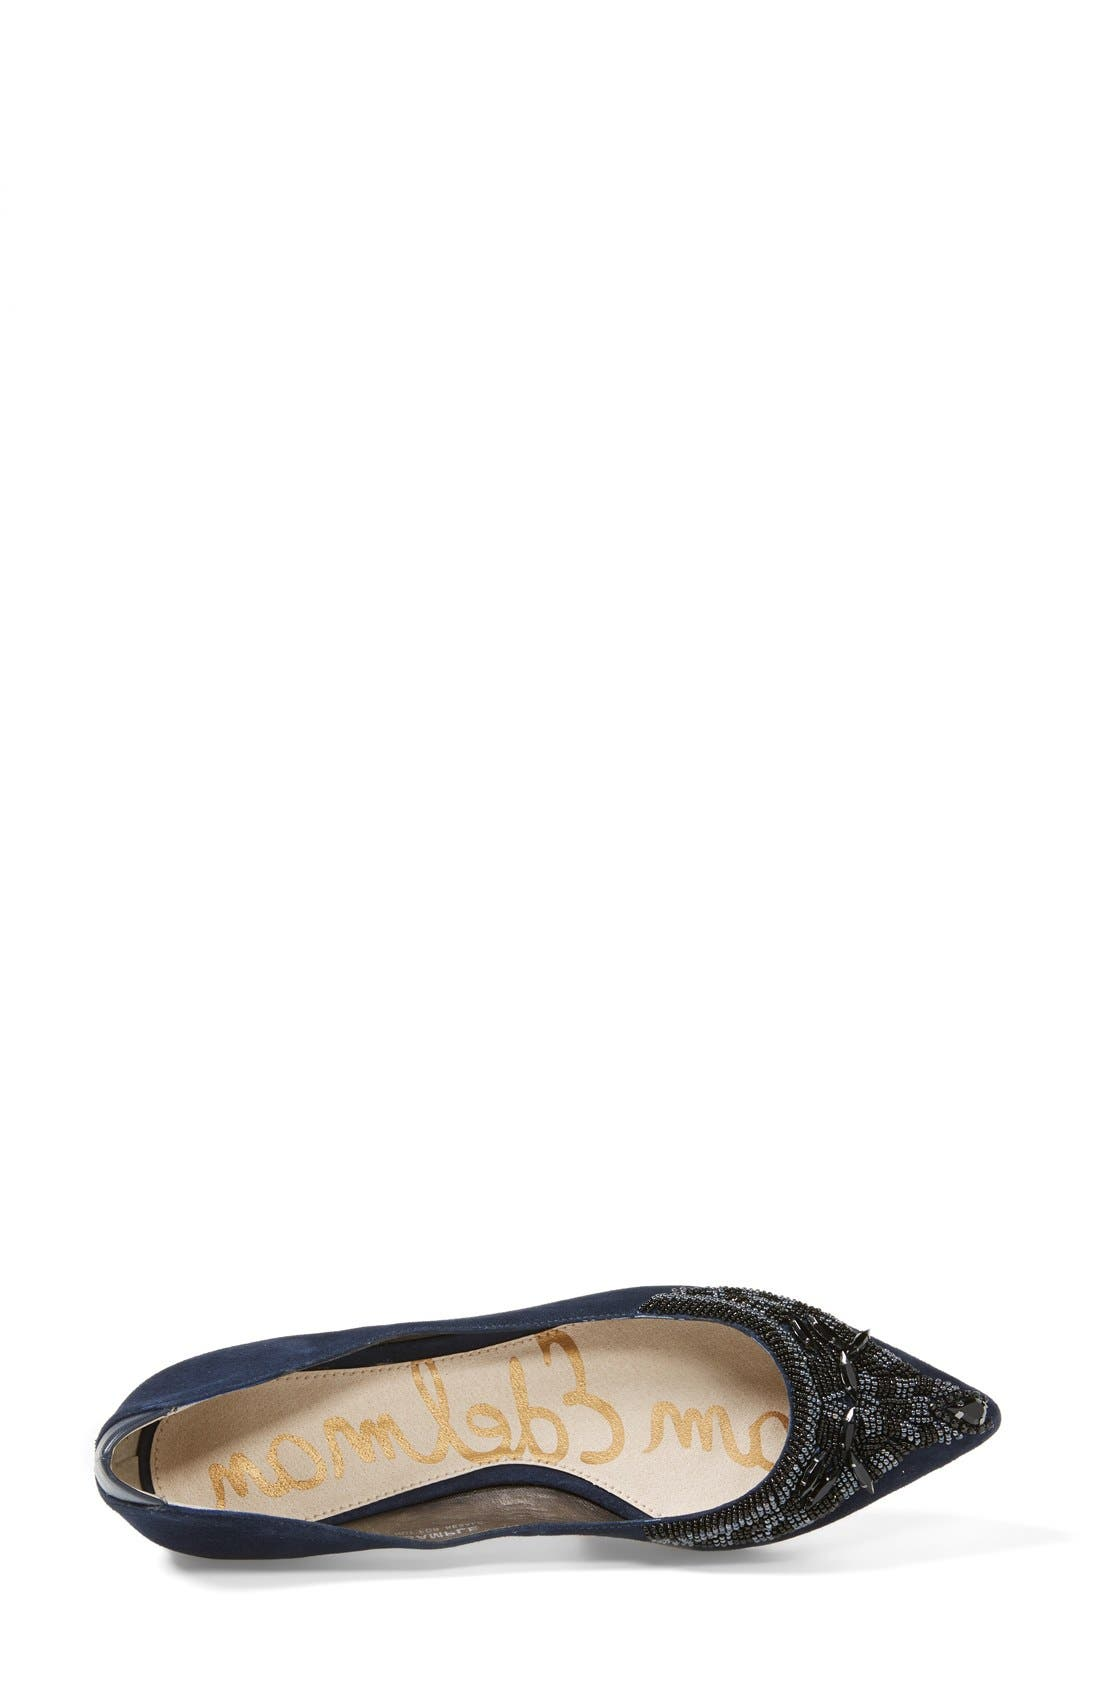 Alternate Image 3  - Sam Edelman 'Cindi' Beaded Pointy Toe Flat (Women)